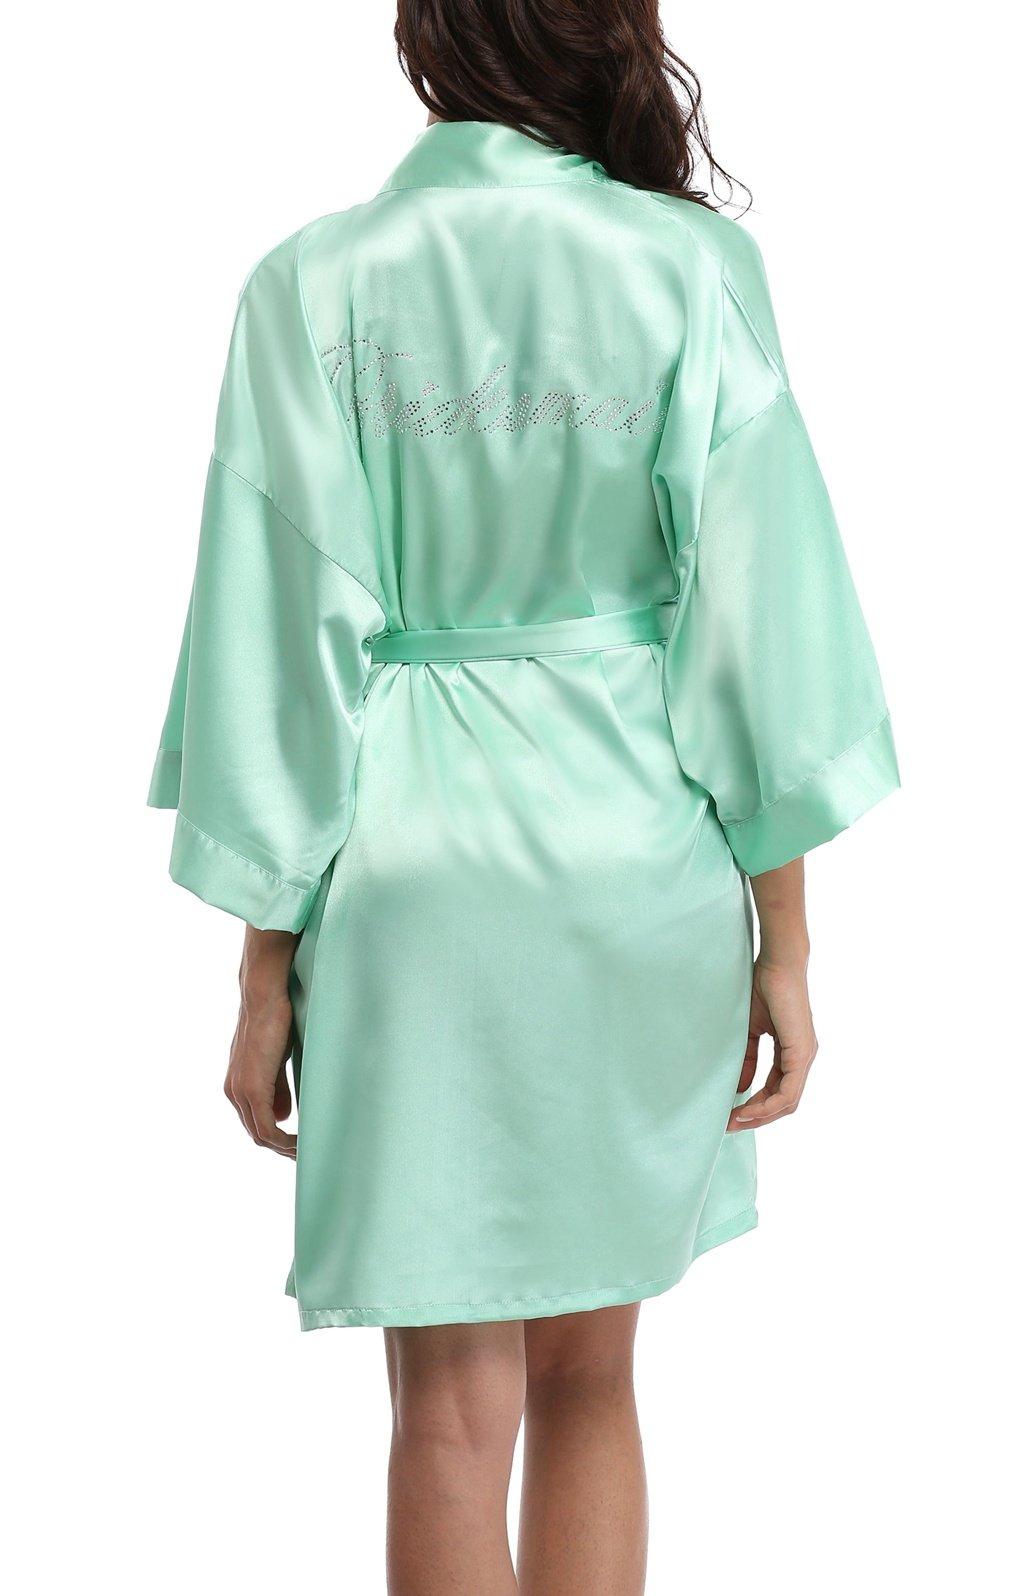 WitBuy Women's Short Satin Kimono Robe Pure Nightgown Wedding Bridesmaid Gift Mint Green M